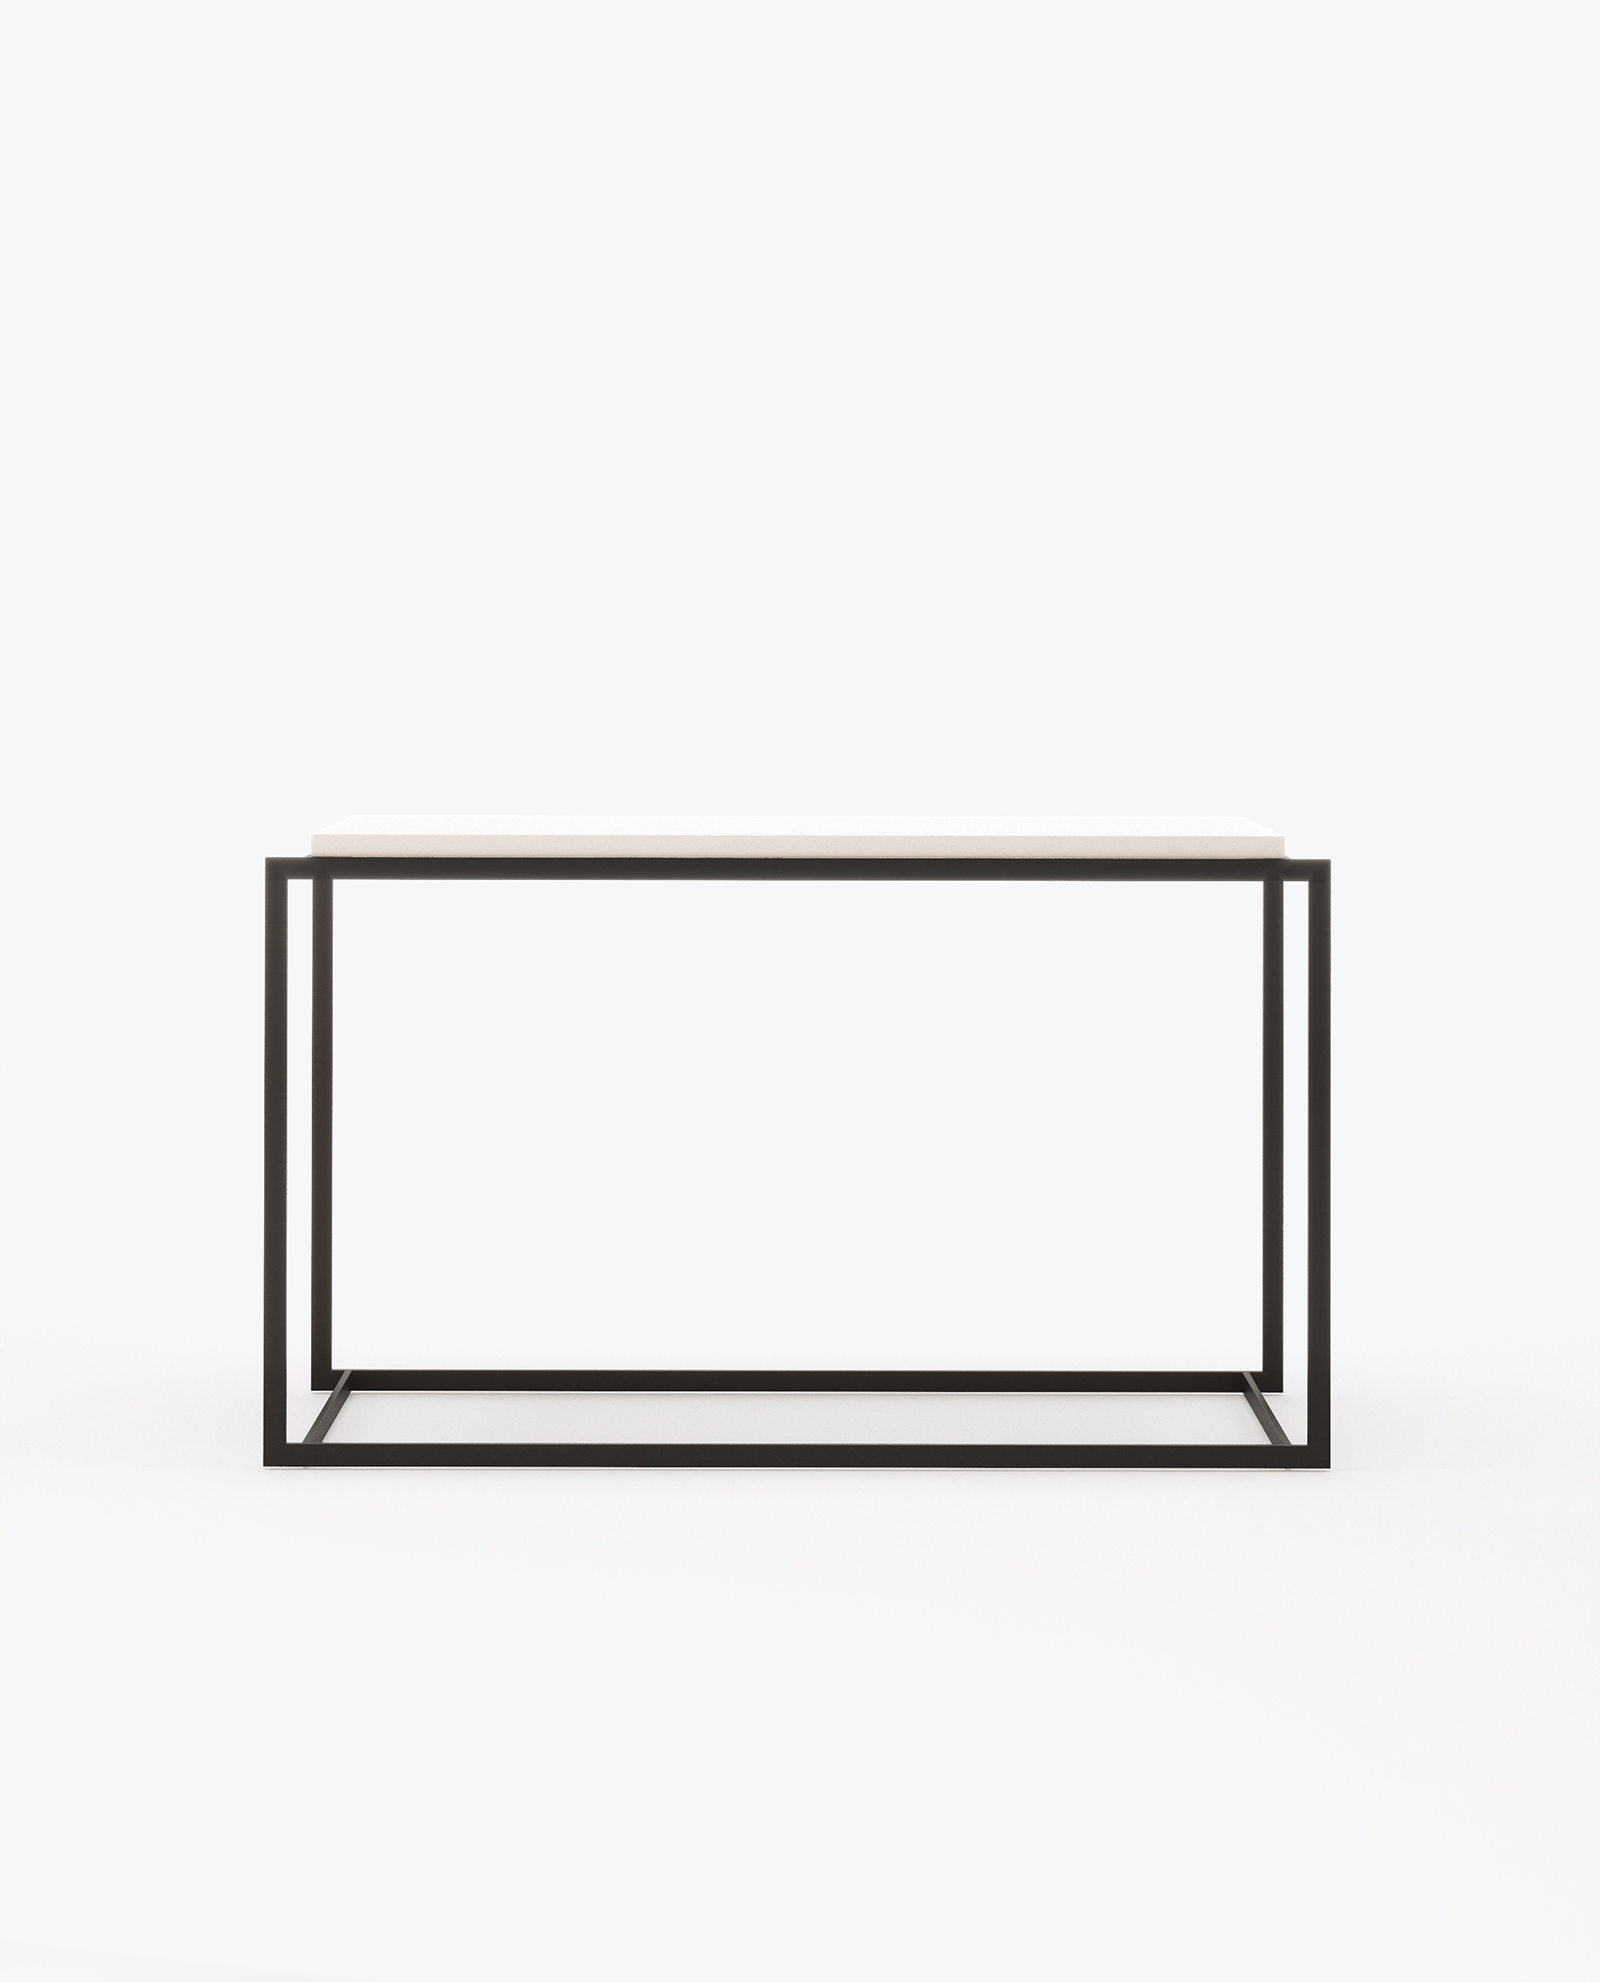 consola-lacado-branco-ferro-preto (2)